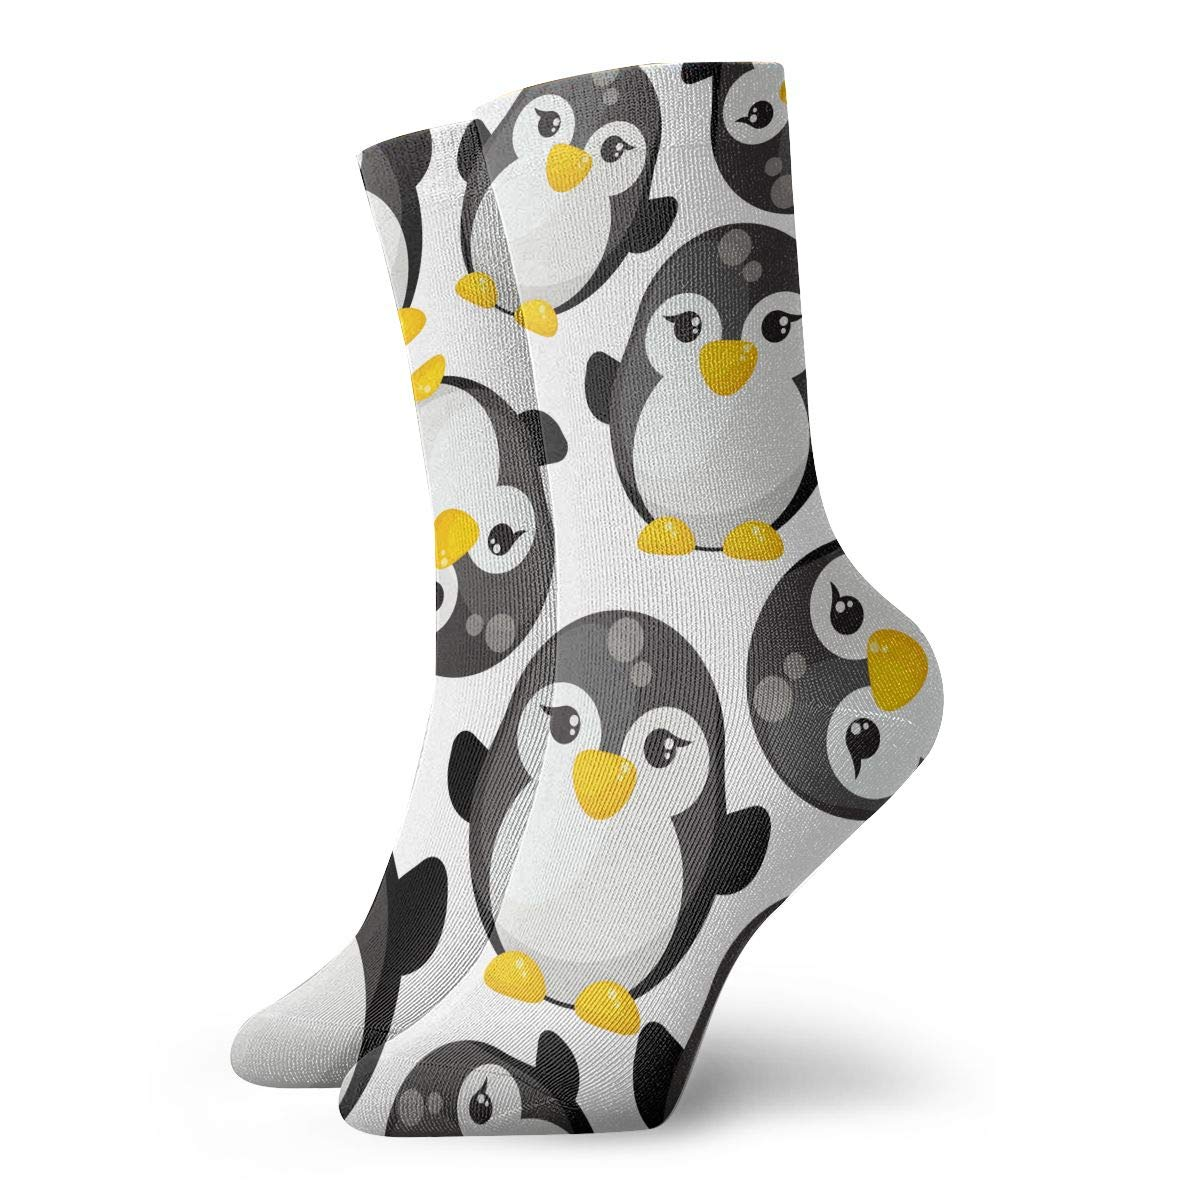 Cute Cartoon Penguins Unisex Funny Casual Crew Socks Athletic Socks For Boys Girls Kids Teenagers